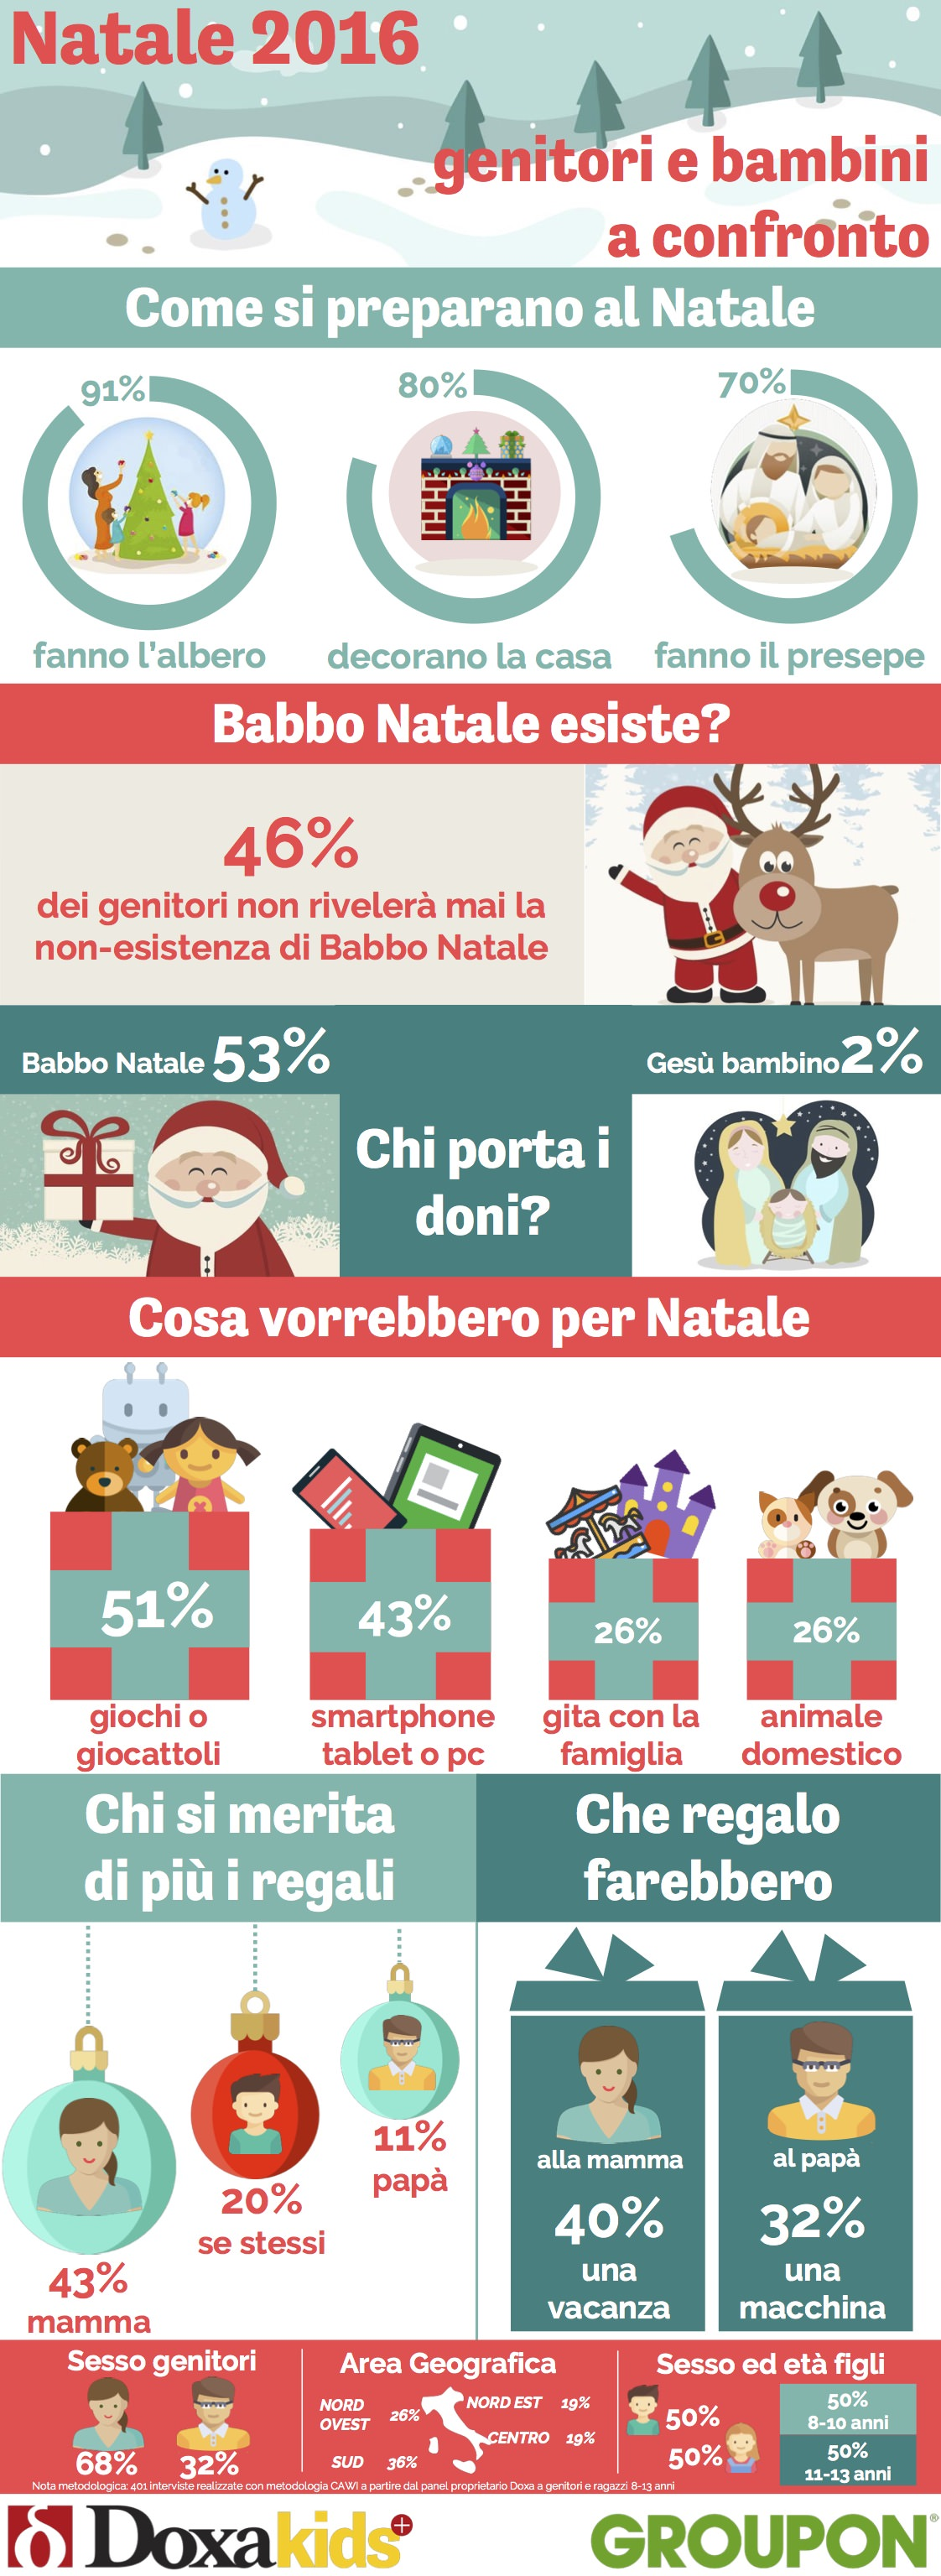 Regali Di Natale Groupon.Natale 2016 I Papa E Gesu Bambino I Grandi Esclusi Doxa